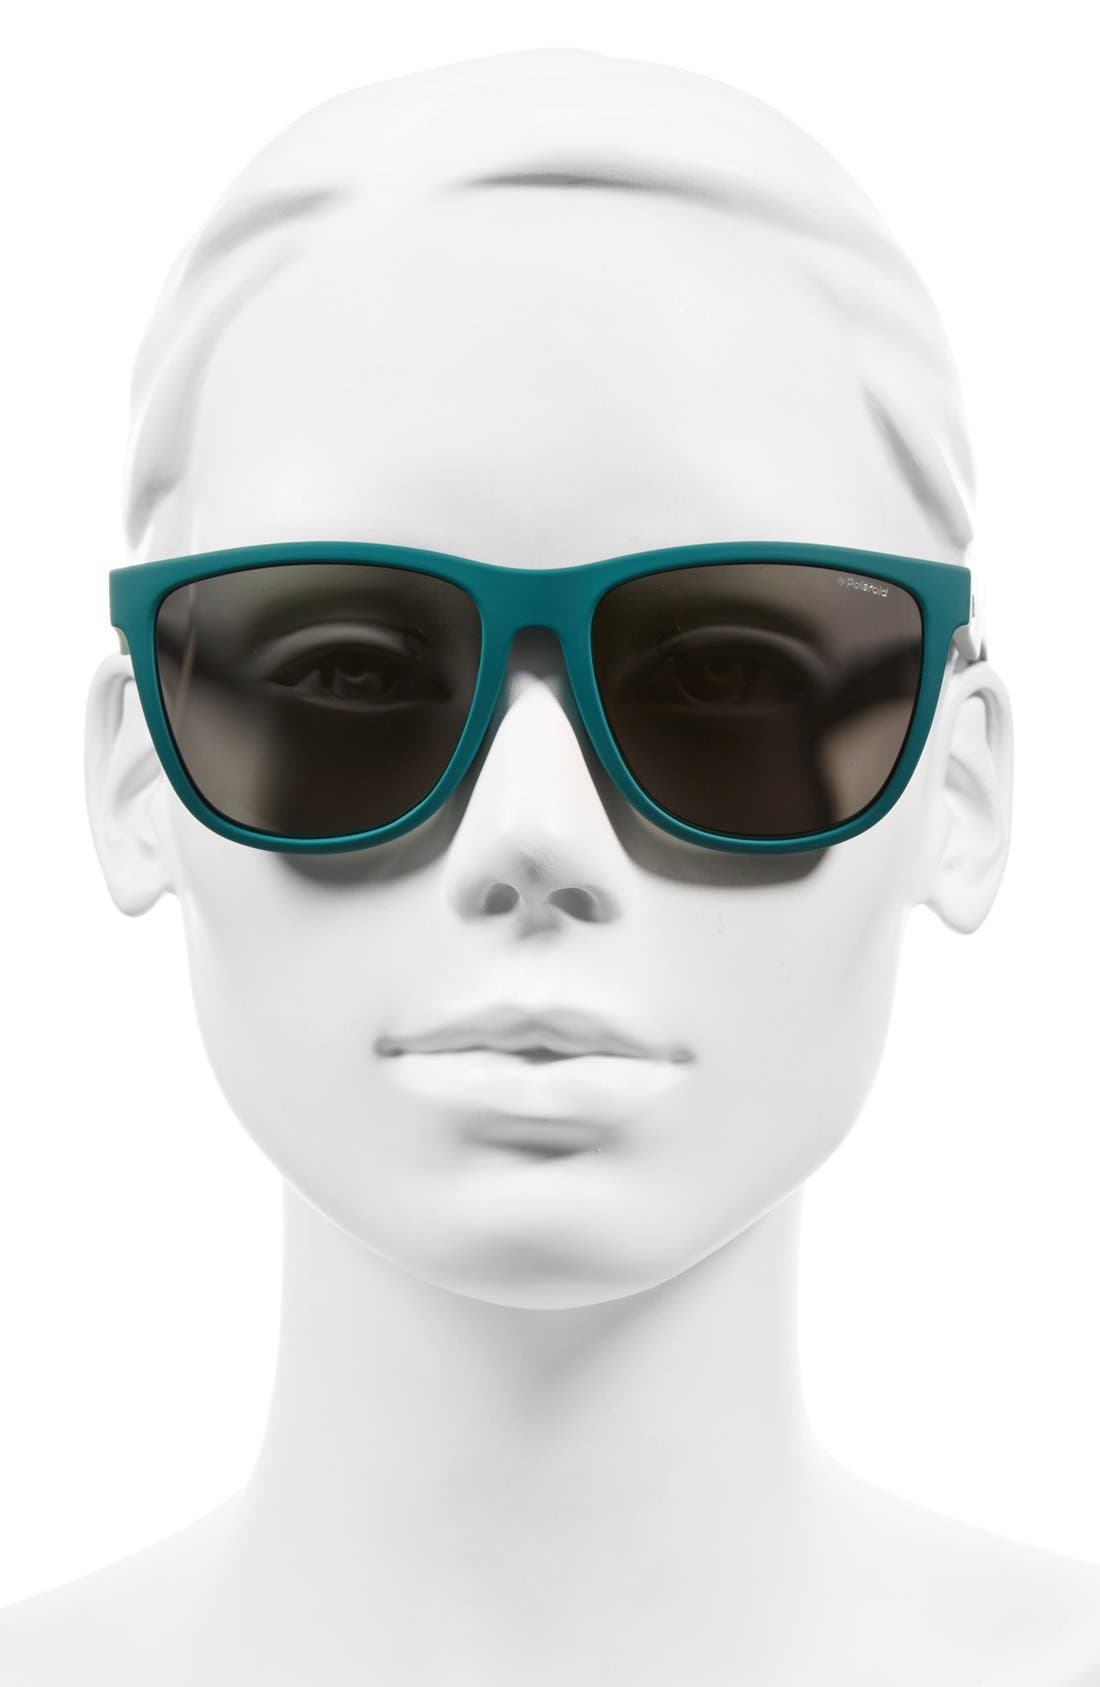 Polaroid 56mm Retro Polarized Sunglasses,                             Alternate thumbnail 2, color,                             GREEN/ GREY GOLD MIRROR